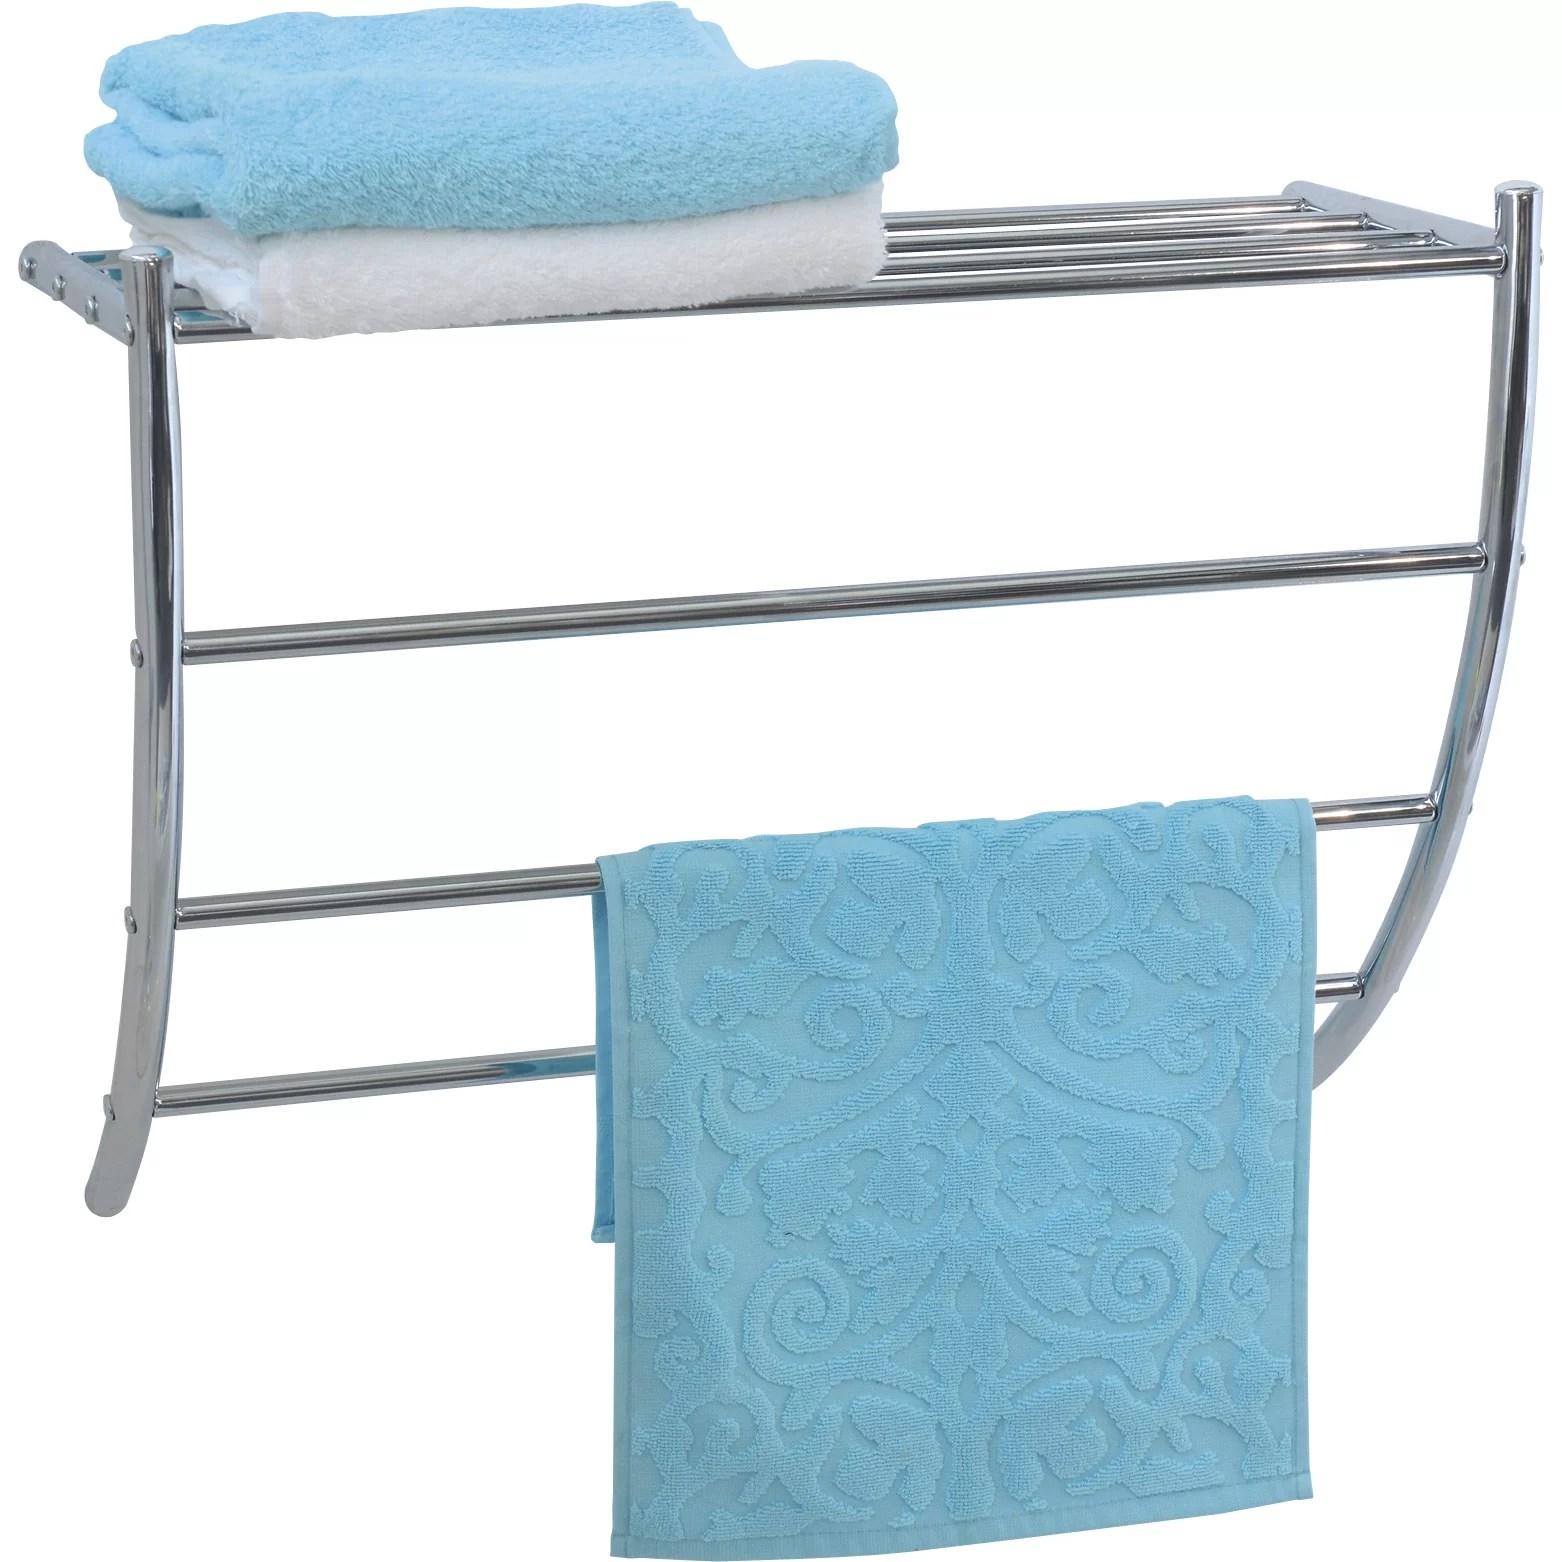 Towel Shelf Rack - Lovequilts